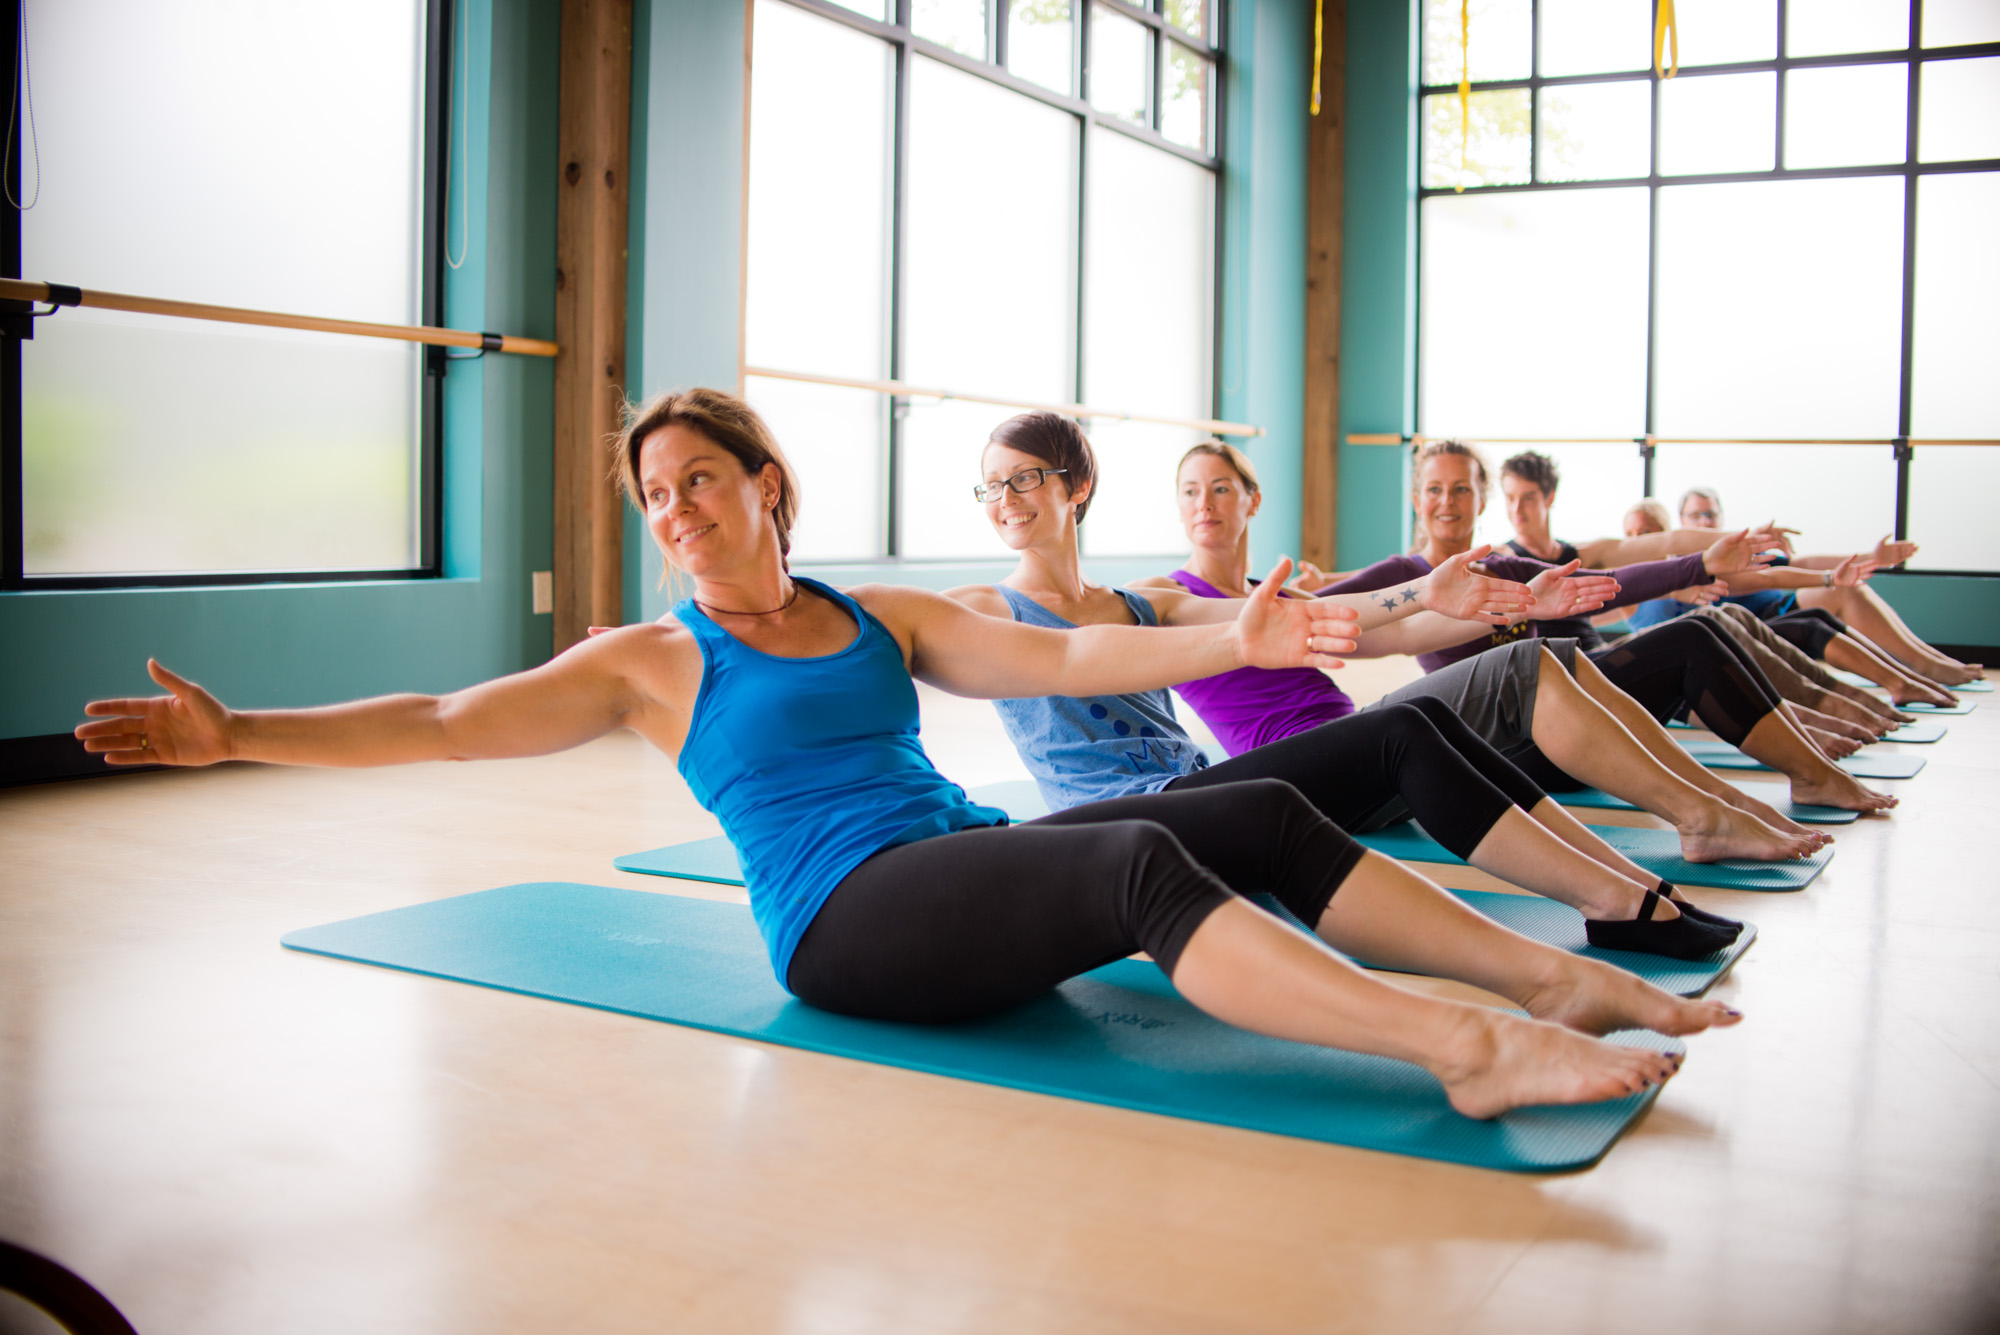 Помогает Ли Фитнес Йога Похудеть. Помогает ли йога похудеть: как занятия влияют на фигуру